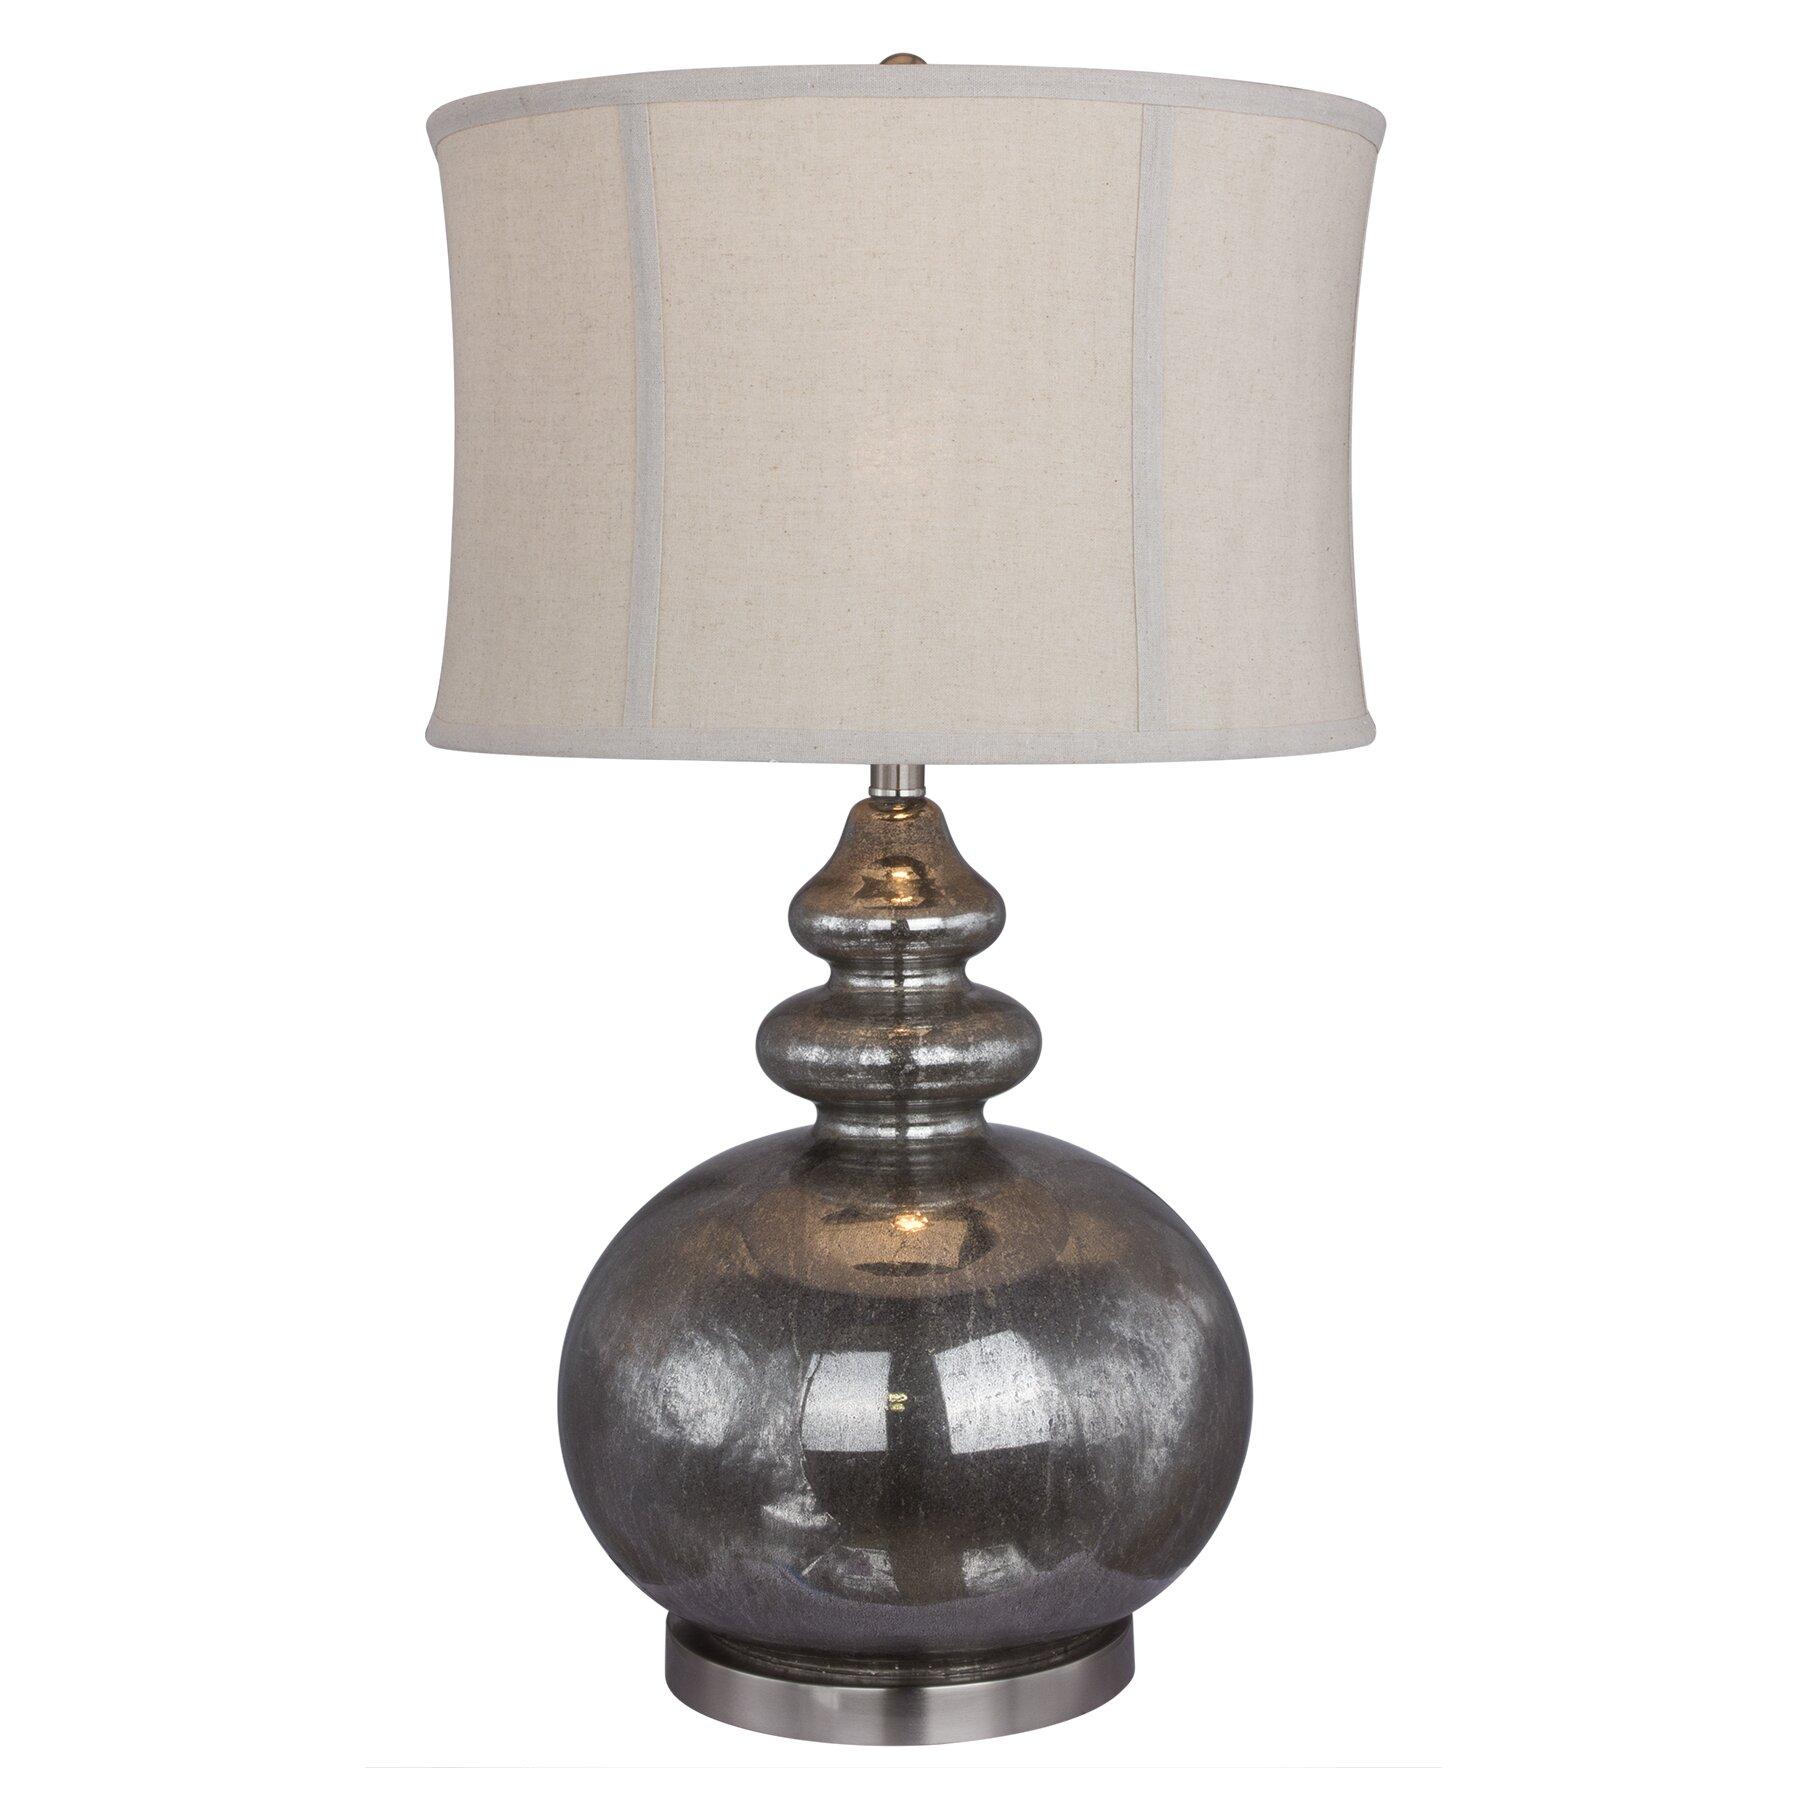 Metal Table Lamps : Lighting Lamps Table Lamps Fangio SKU: FG2179